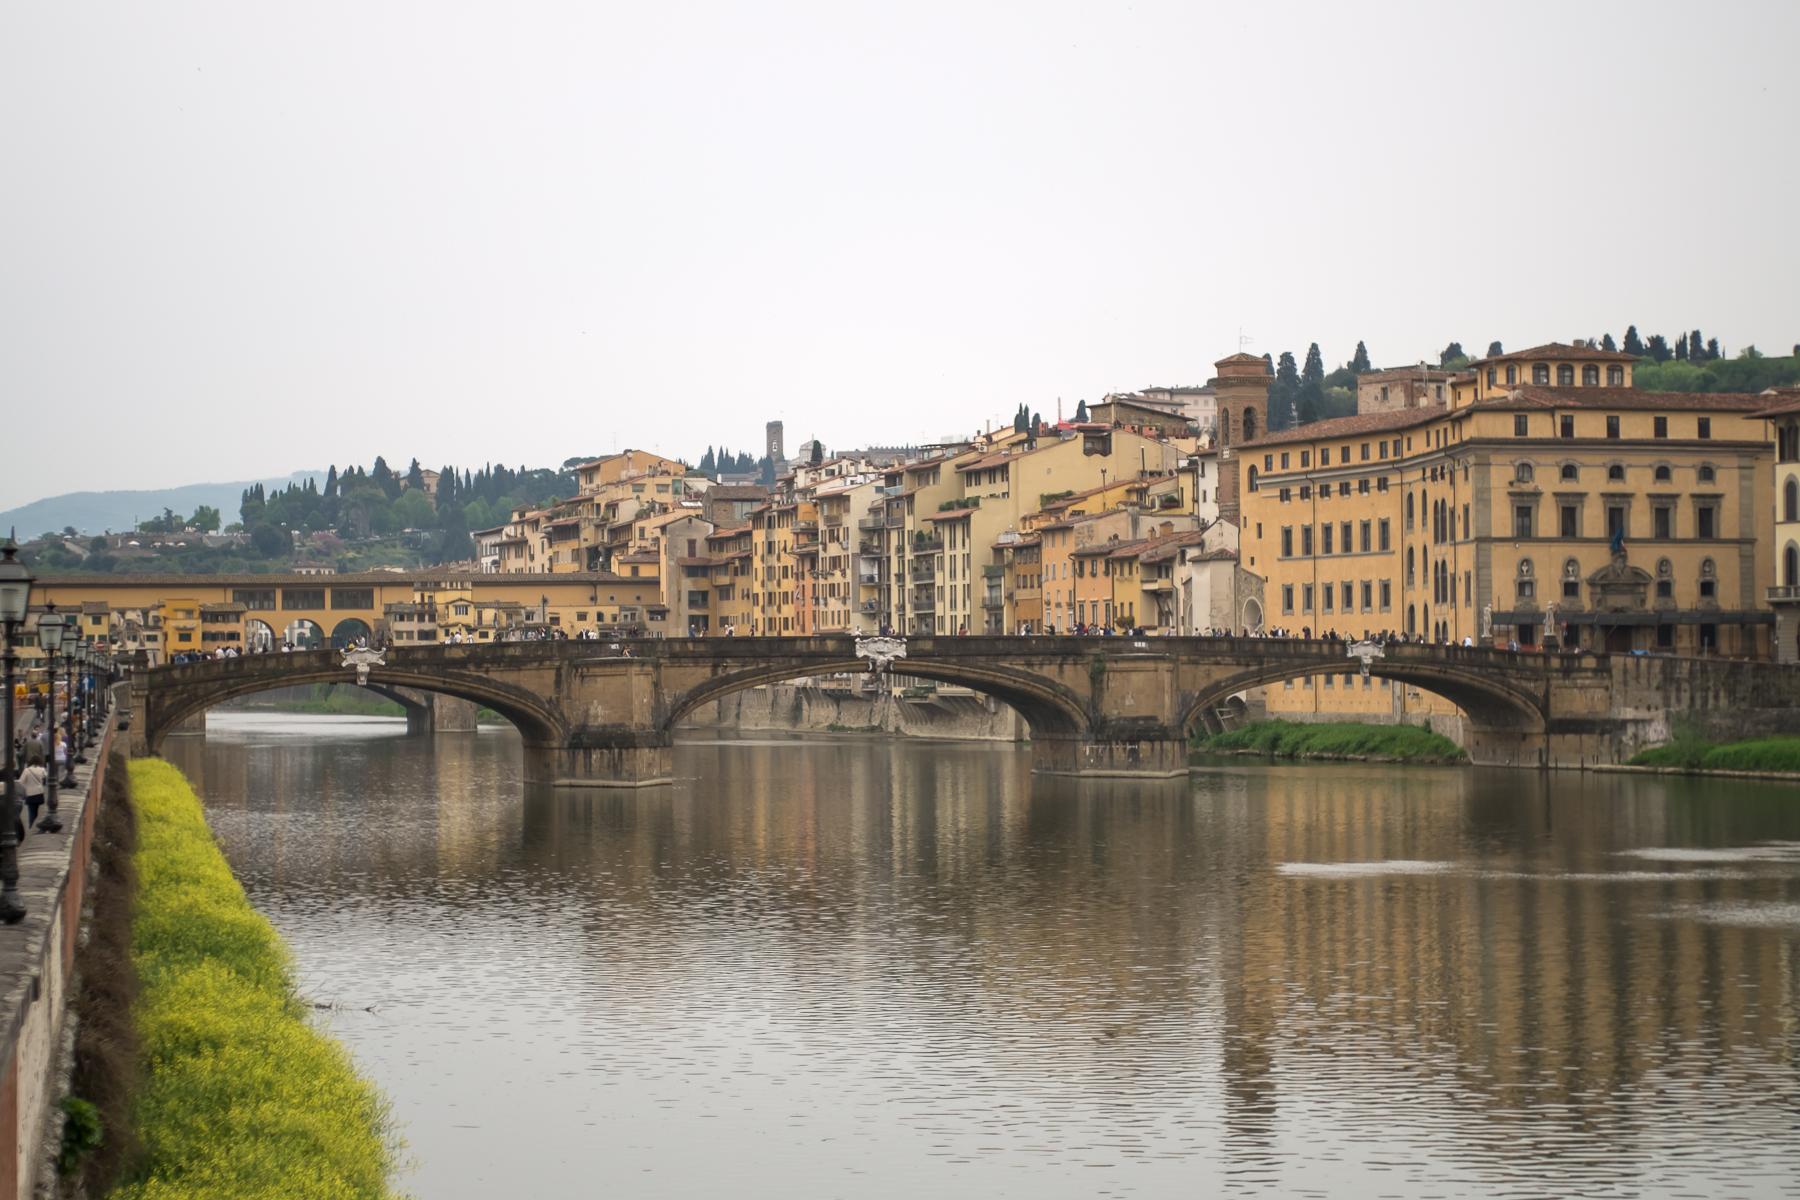 Arno.jpg